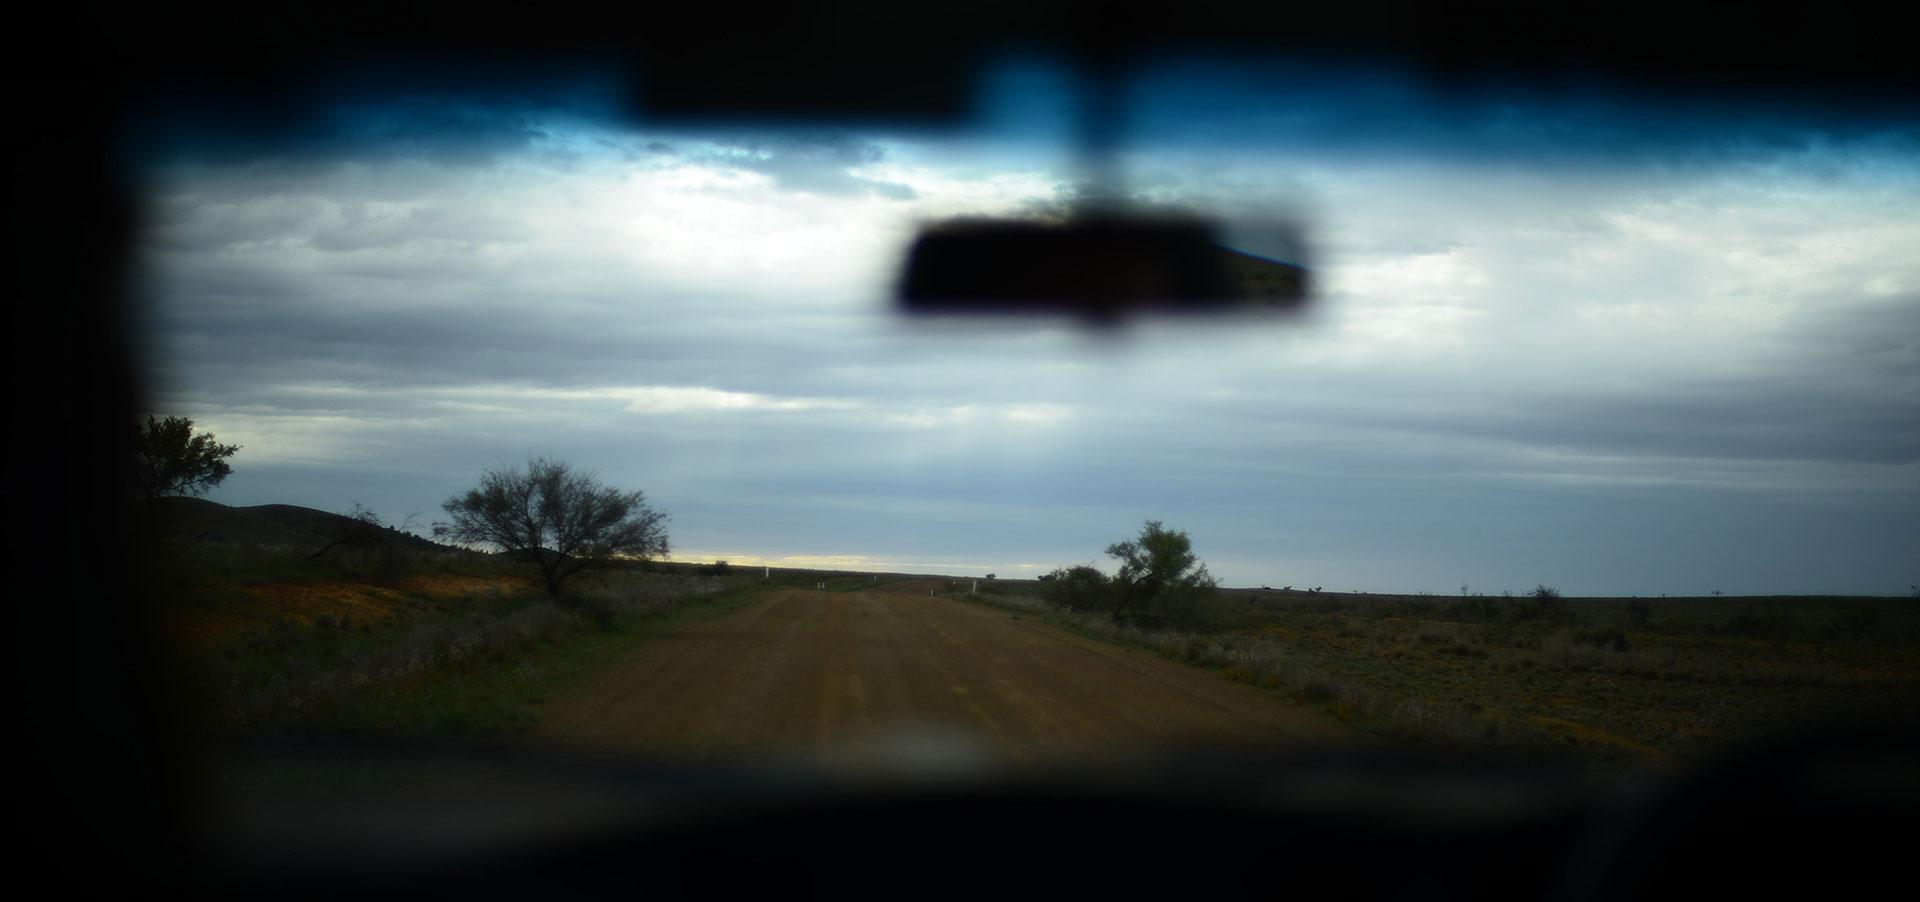 Damian Wyvill Rear View Mirror